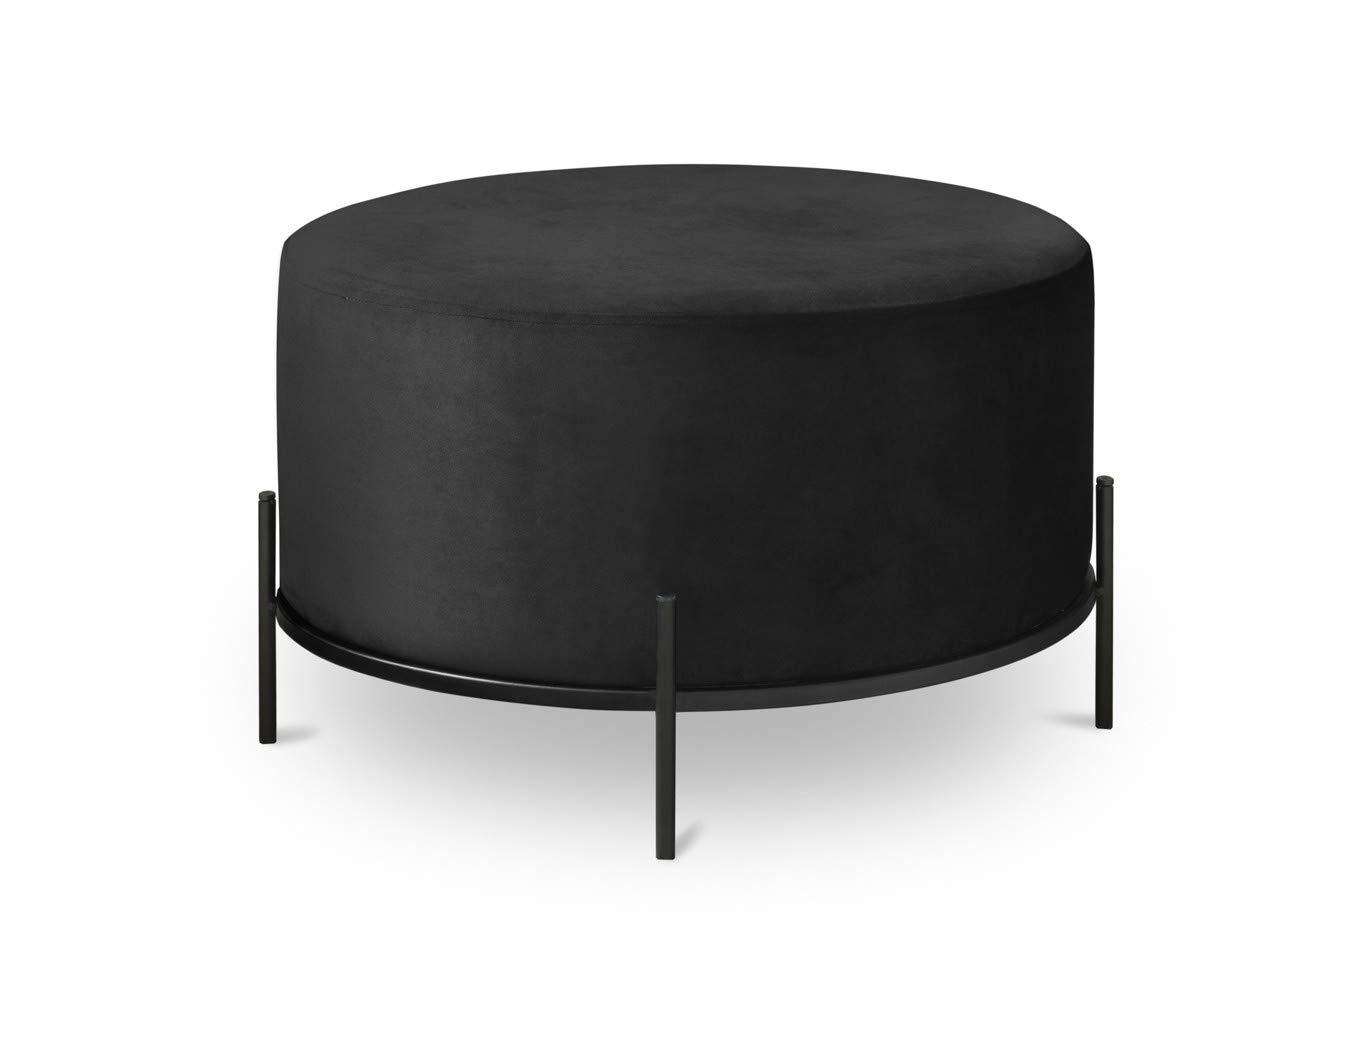 Lifa Living Round Velvet Ottoman Footstool Coffee Side Table Modern Upholstered Dressing Chair For Living Room Bedroom Office Black Metal Frame